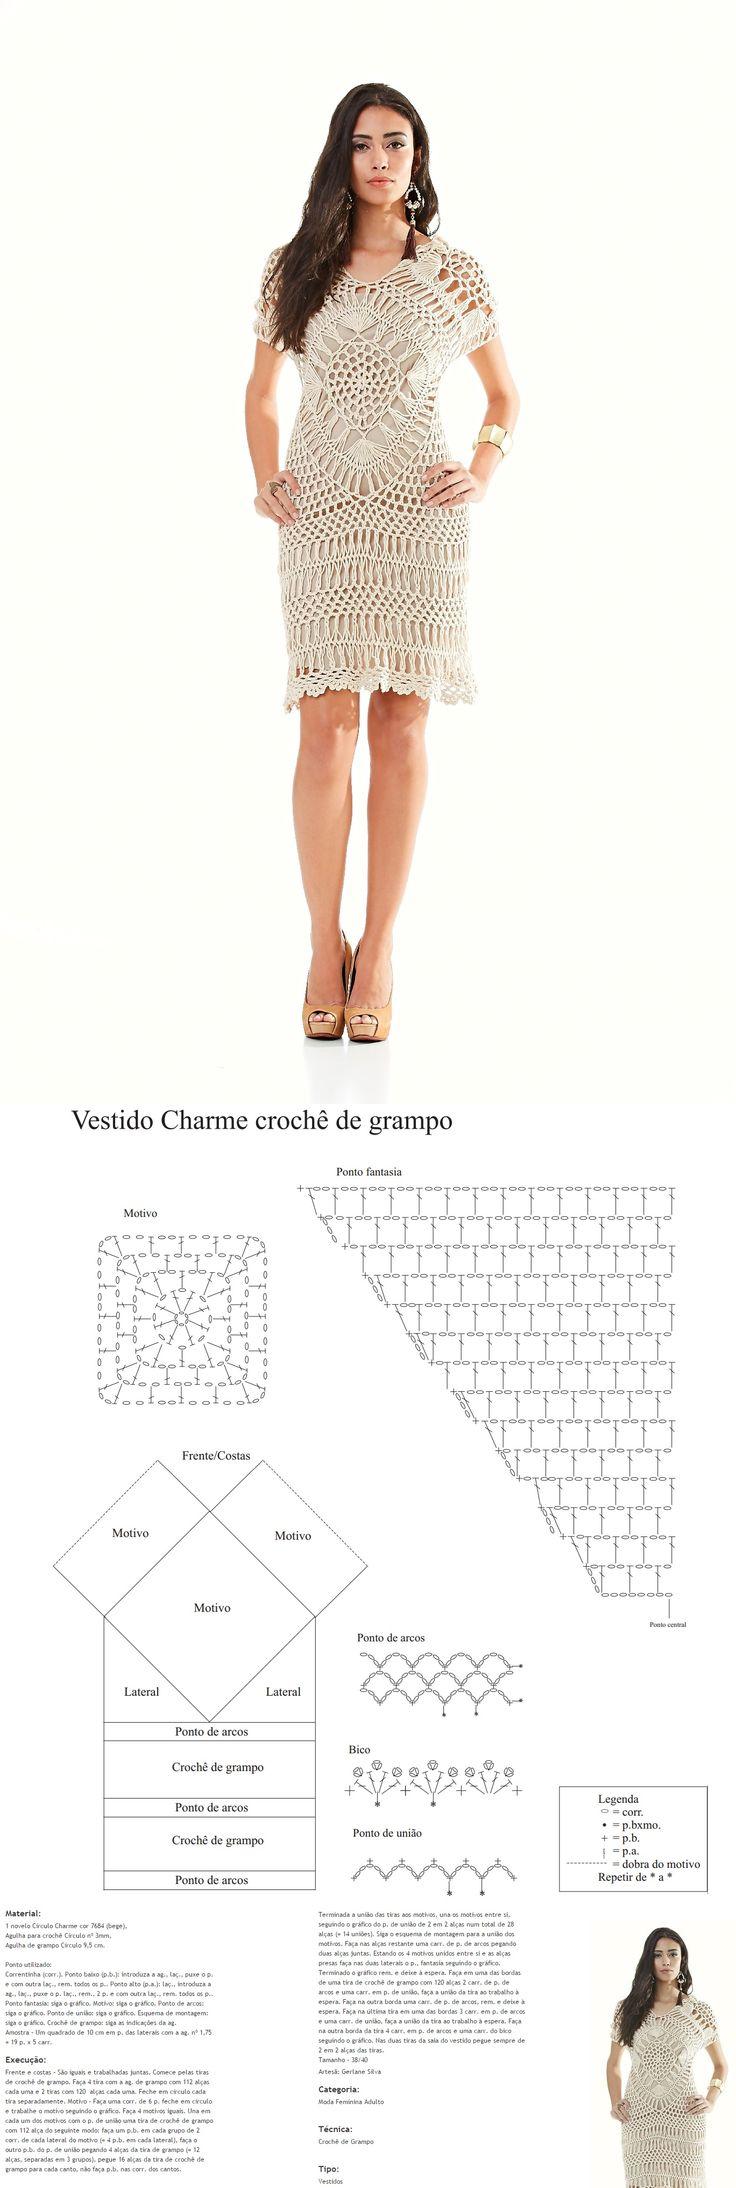 Receitas Círculo - Vestido Charme Crochê de Grampo